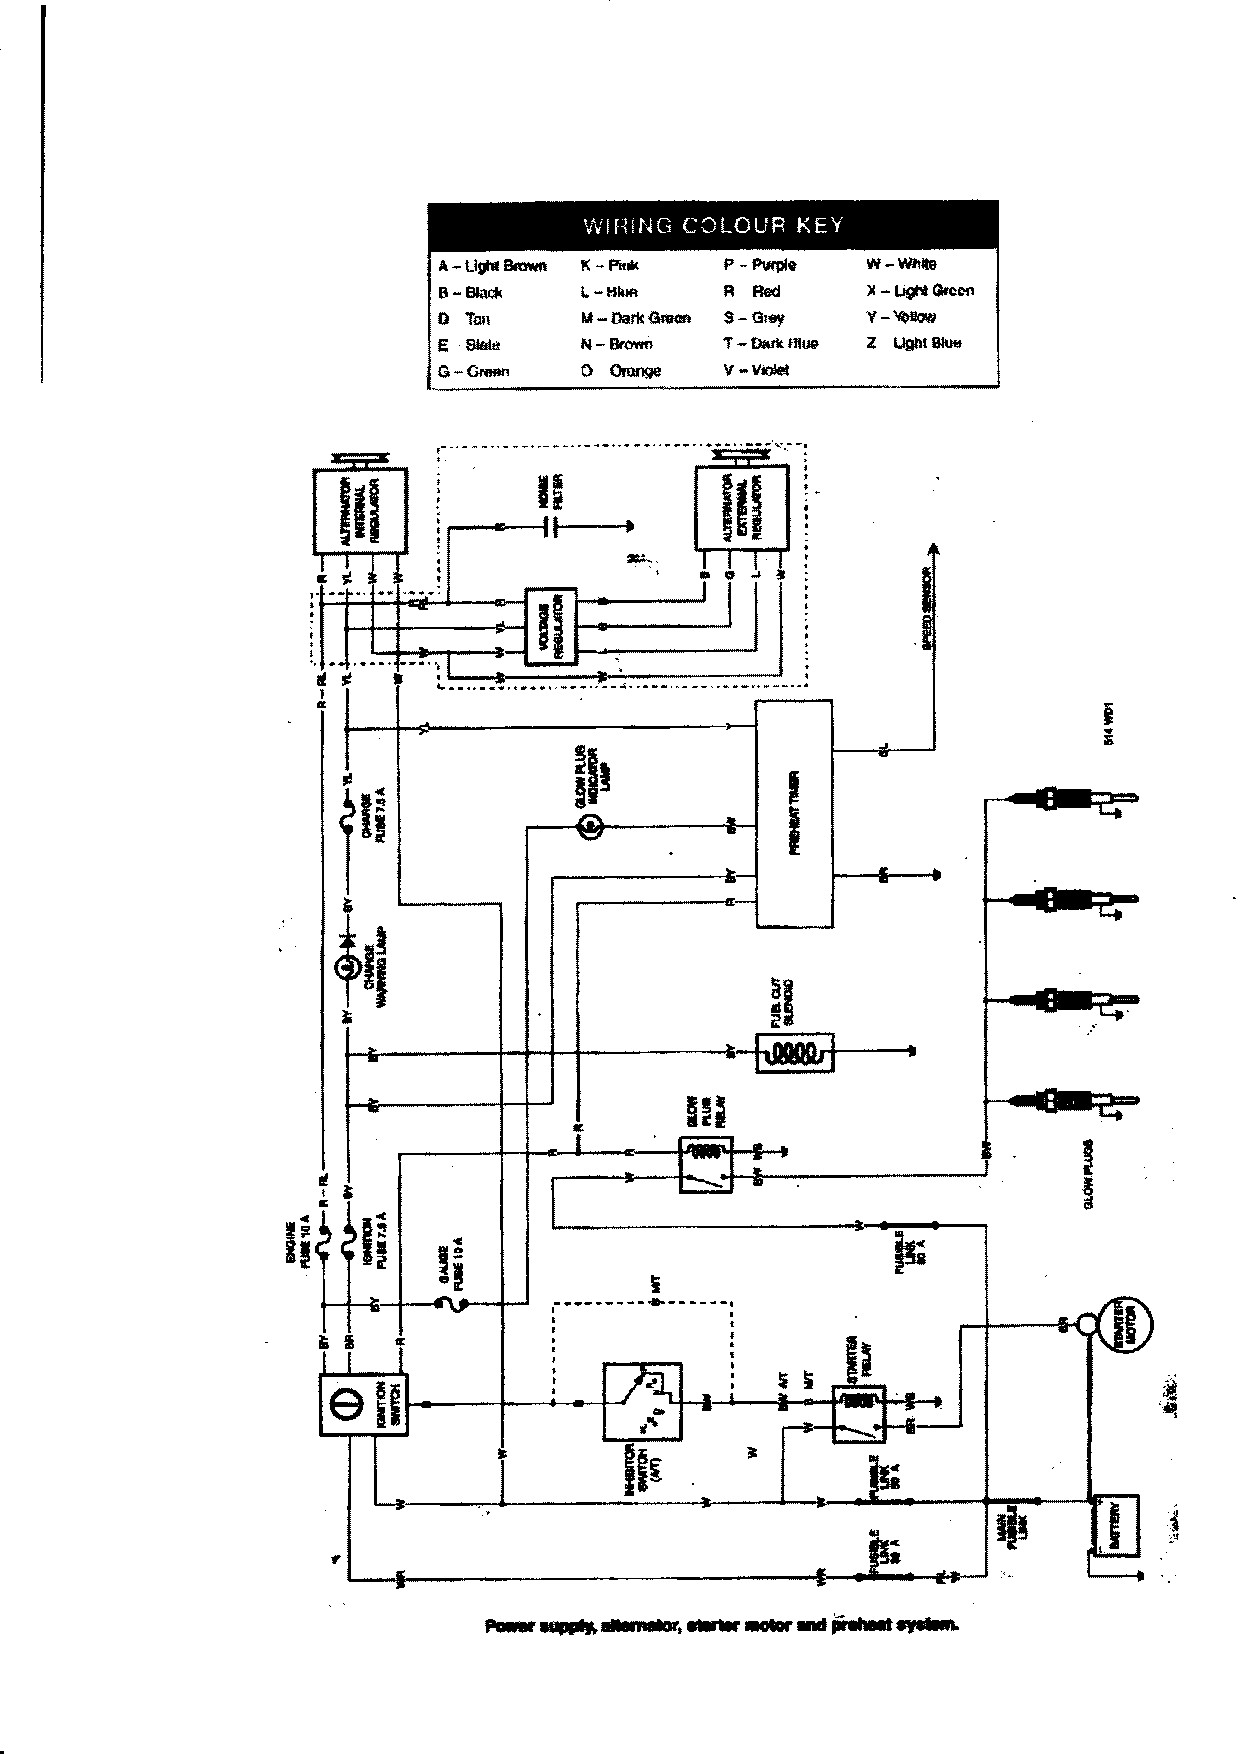 heat plugs